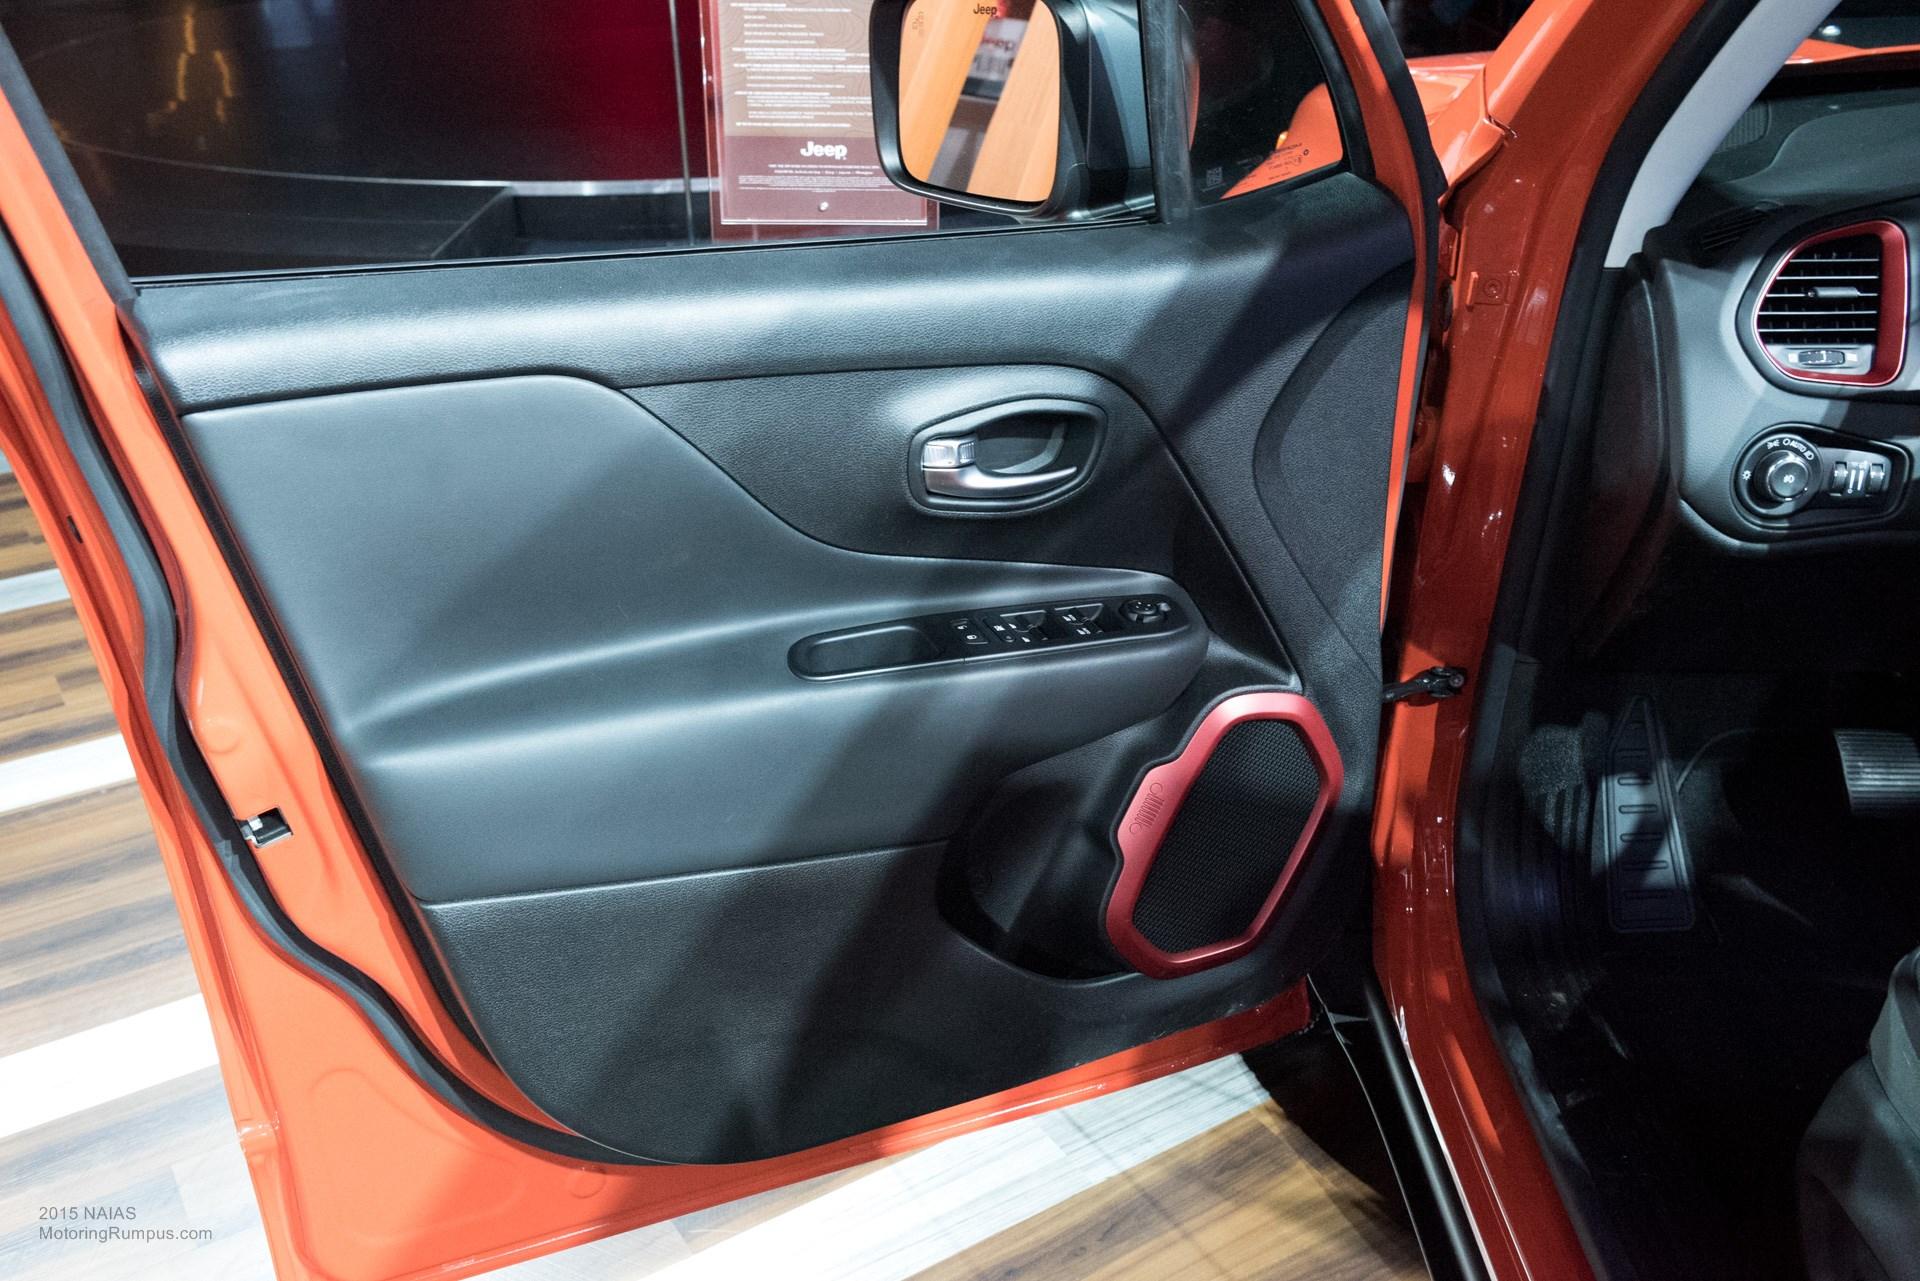 2015 naias jeep renegade trailhawk interior motoring rumpus - Jeep renegade trailhawk interior ...